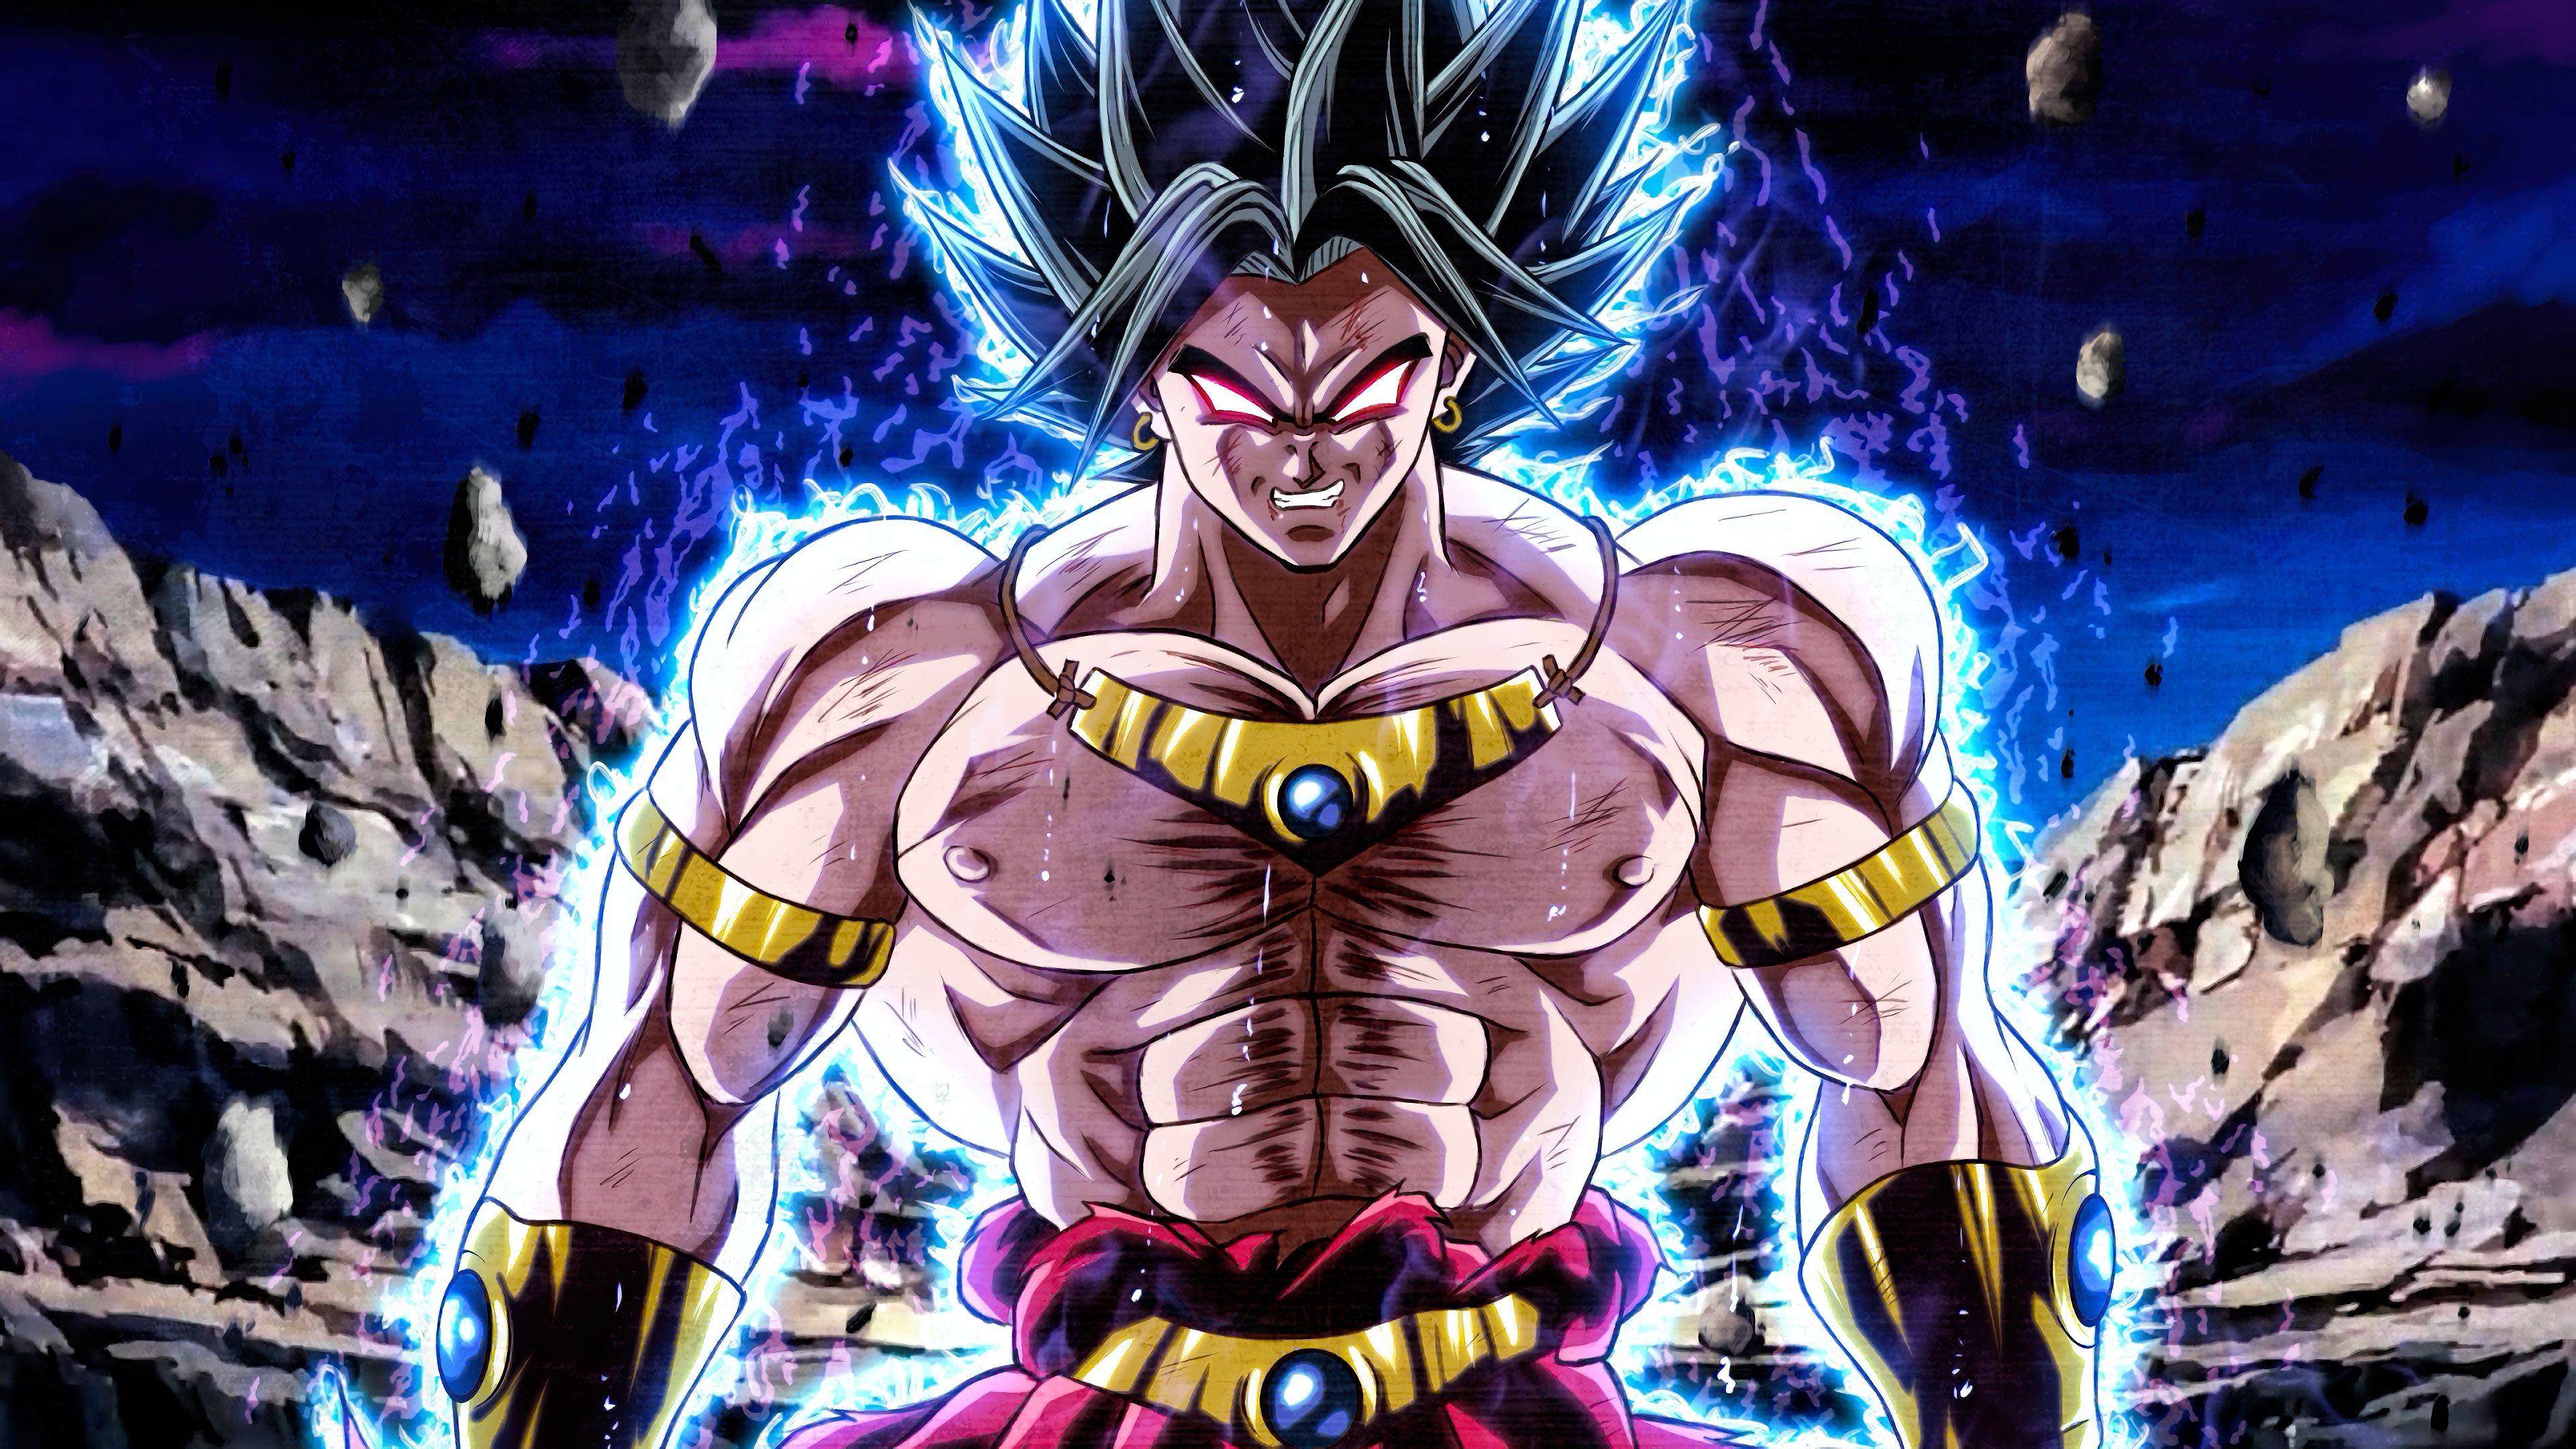 Broly, Ultra Instinct, Dragon Ball Super, Anime, 3840x2160